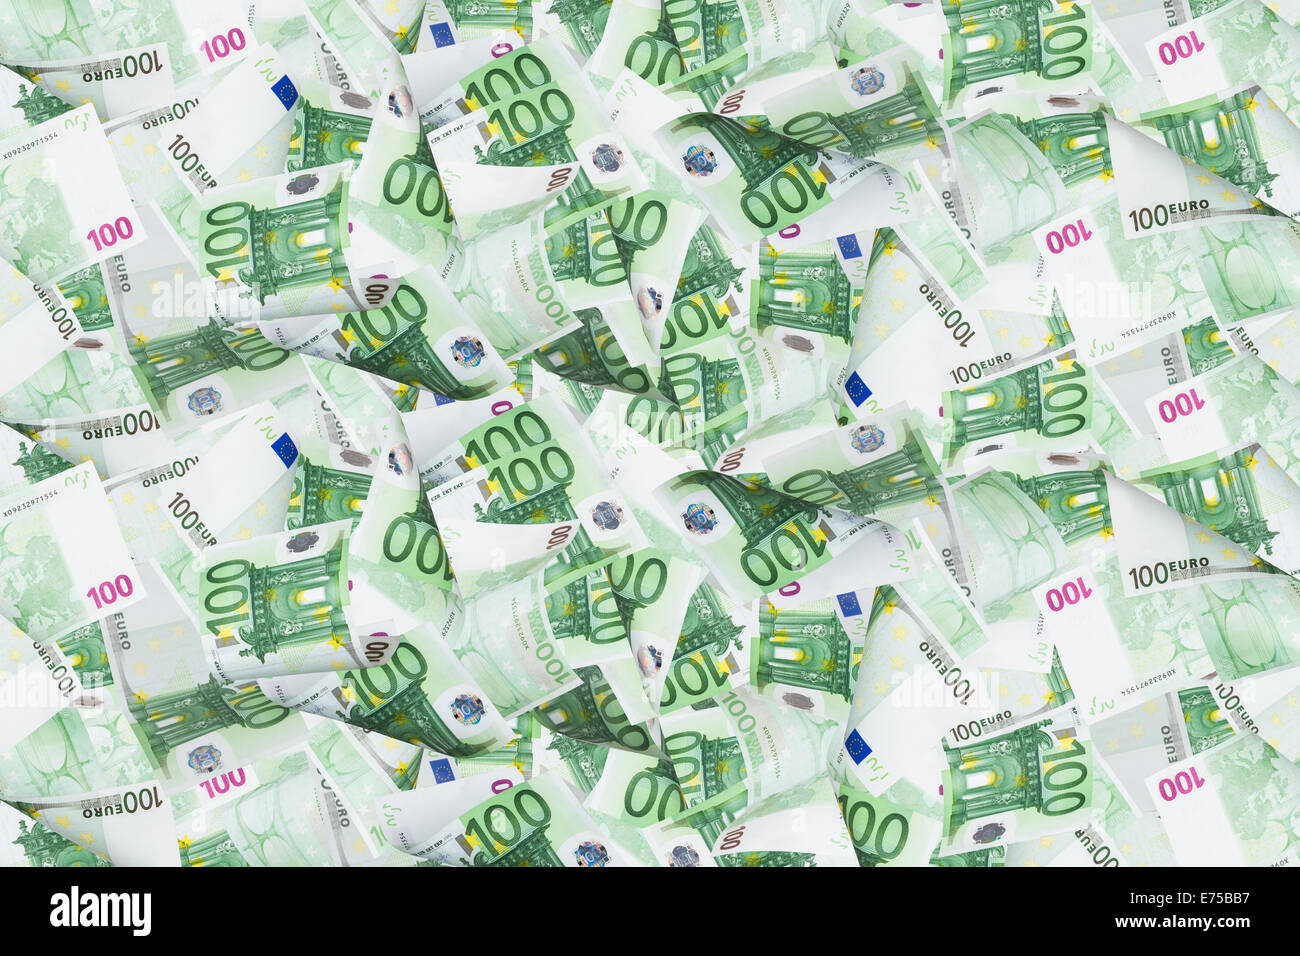 Full of euro money banknotes as texture Stock Photo